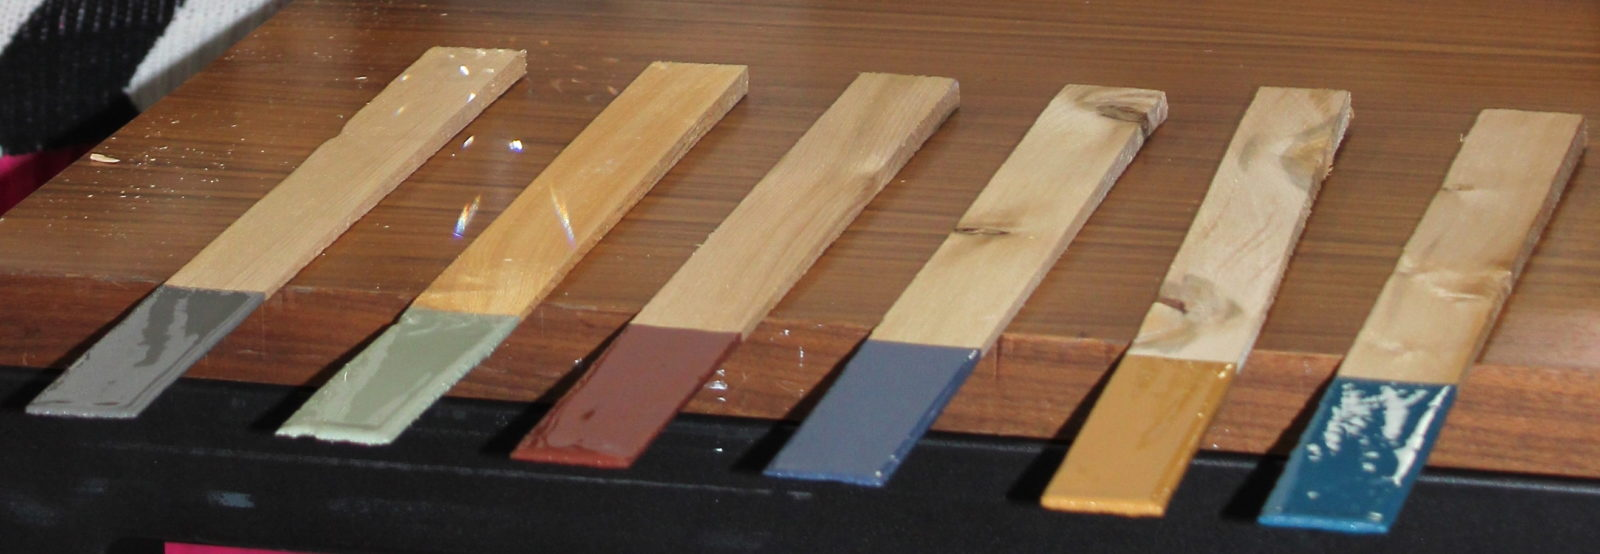 paint colors on stir sticks